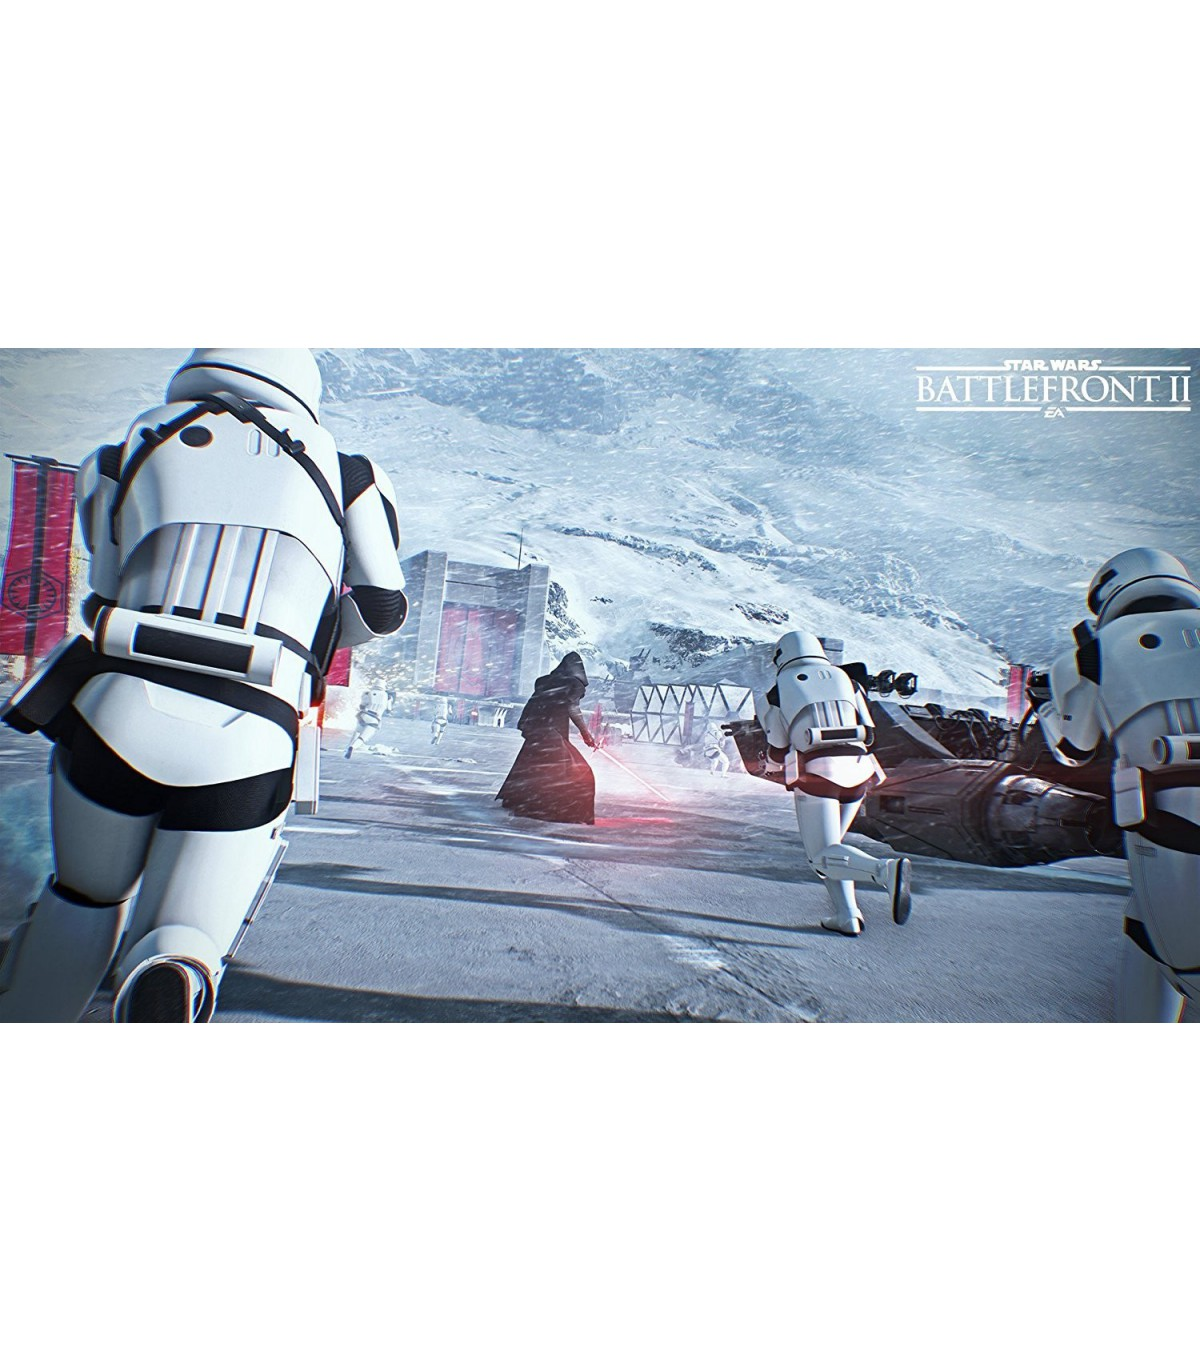 بازی Star Wars Battlefront II: Elite Trooper Deluxe Edition